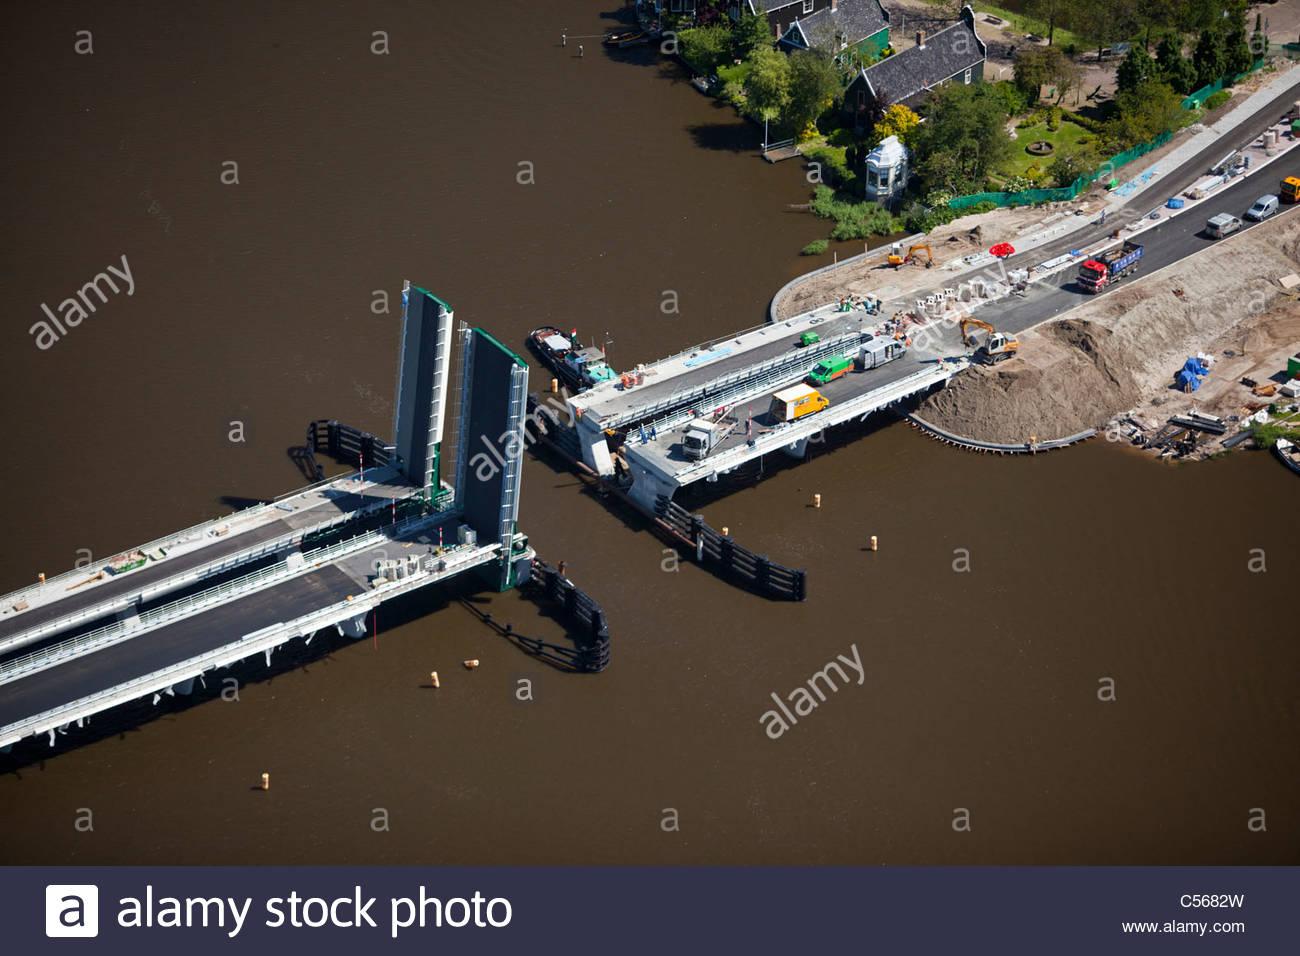 Niederlande, Zaanse Schans, Brücke am Fluss Zaan öffnen zur Reparatur. Luft. Stockbild